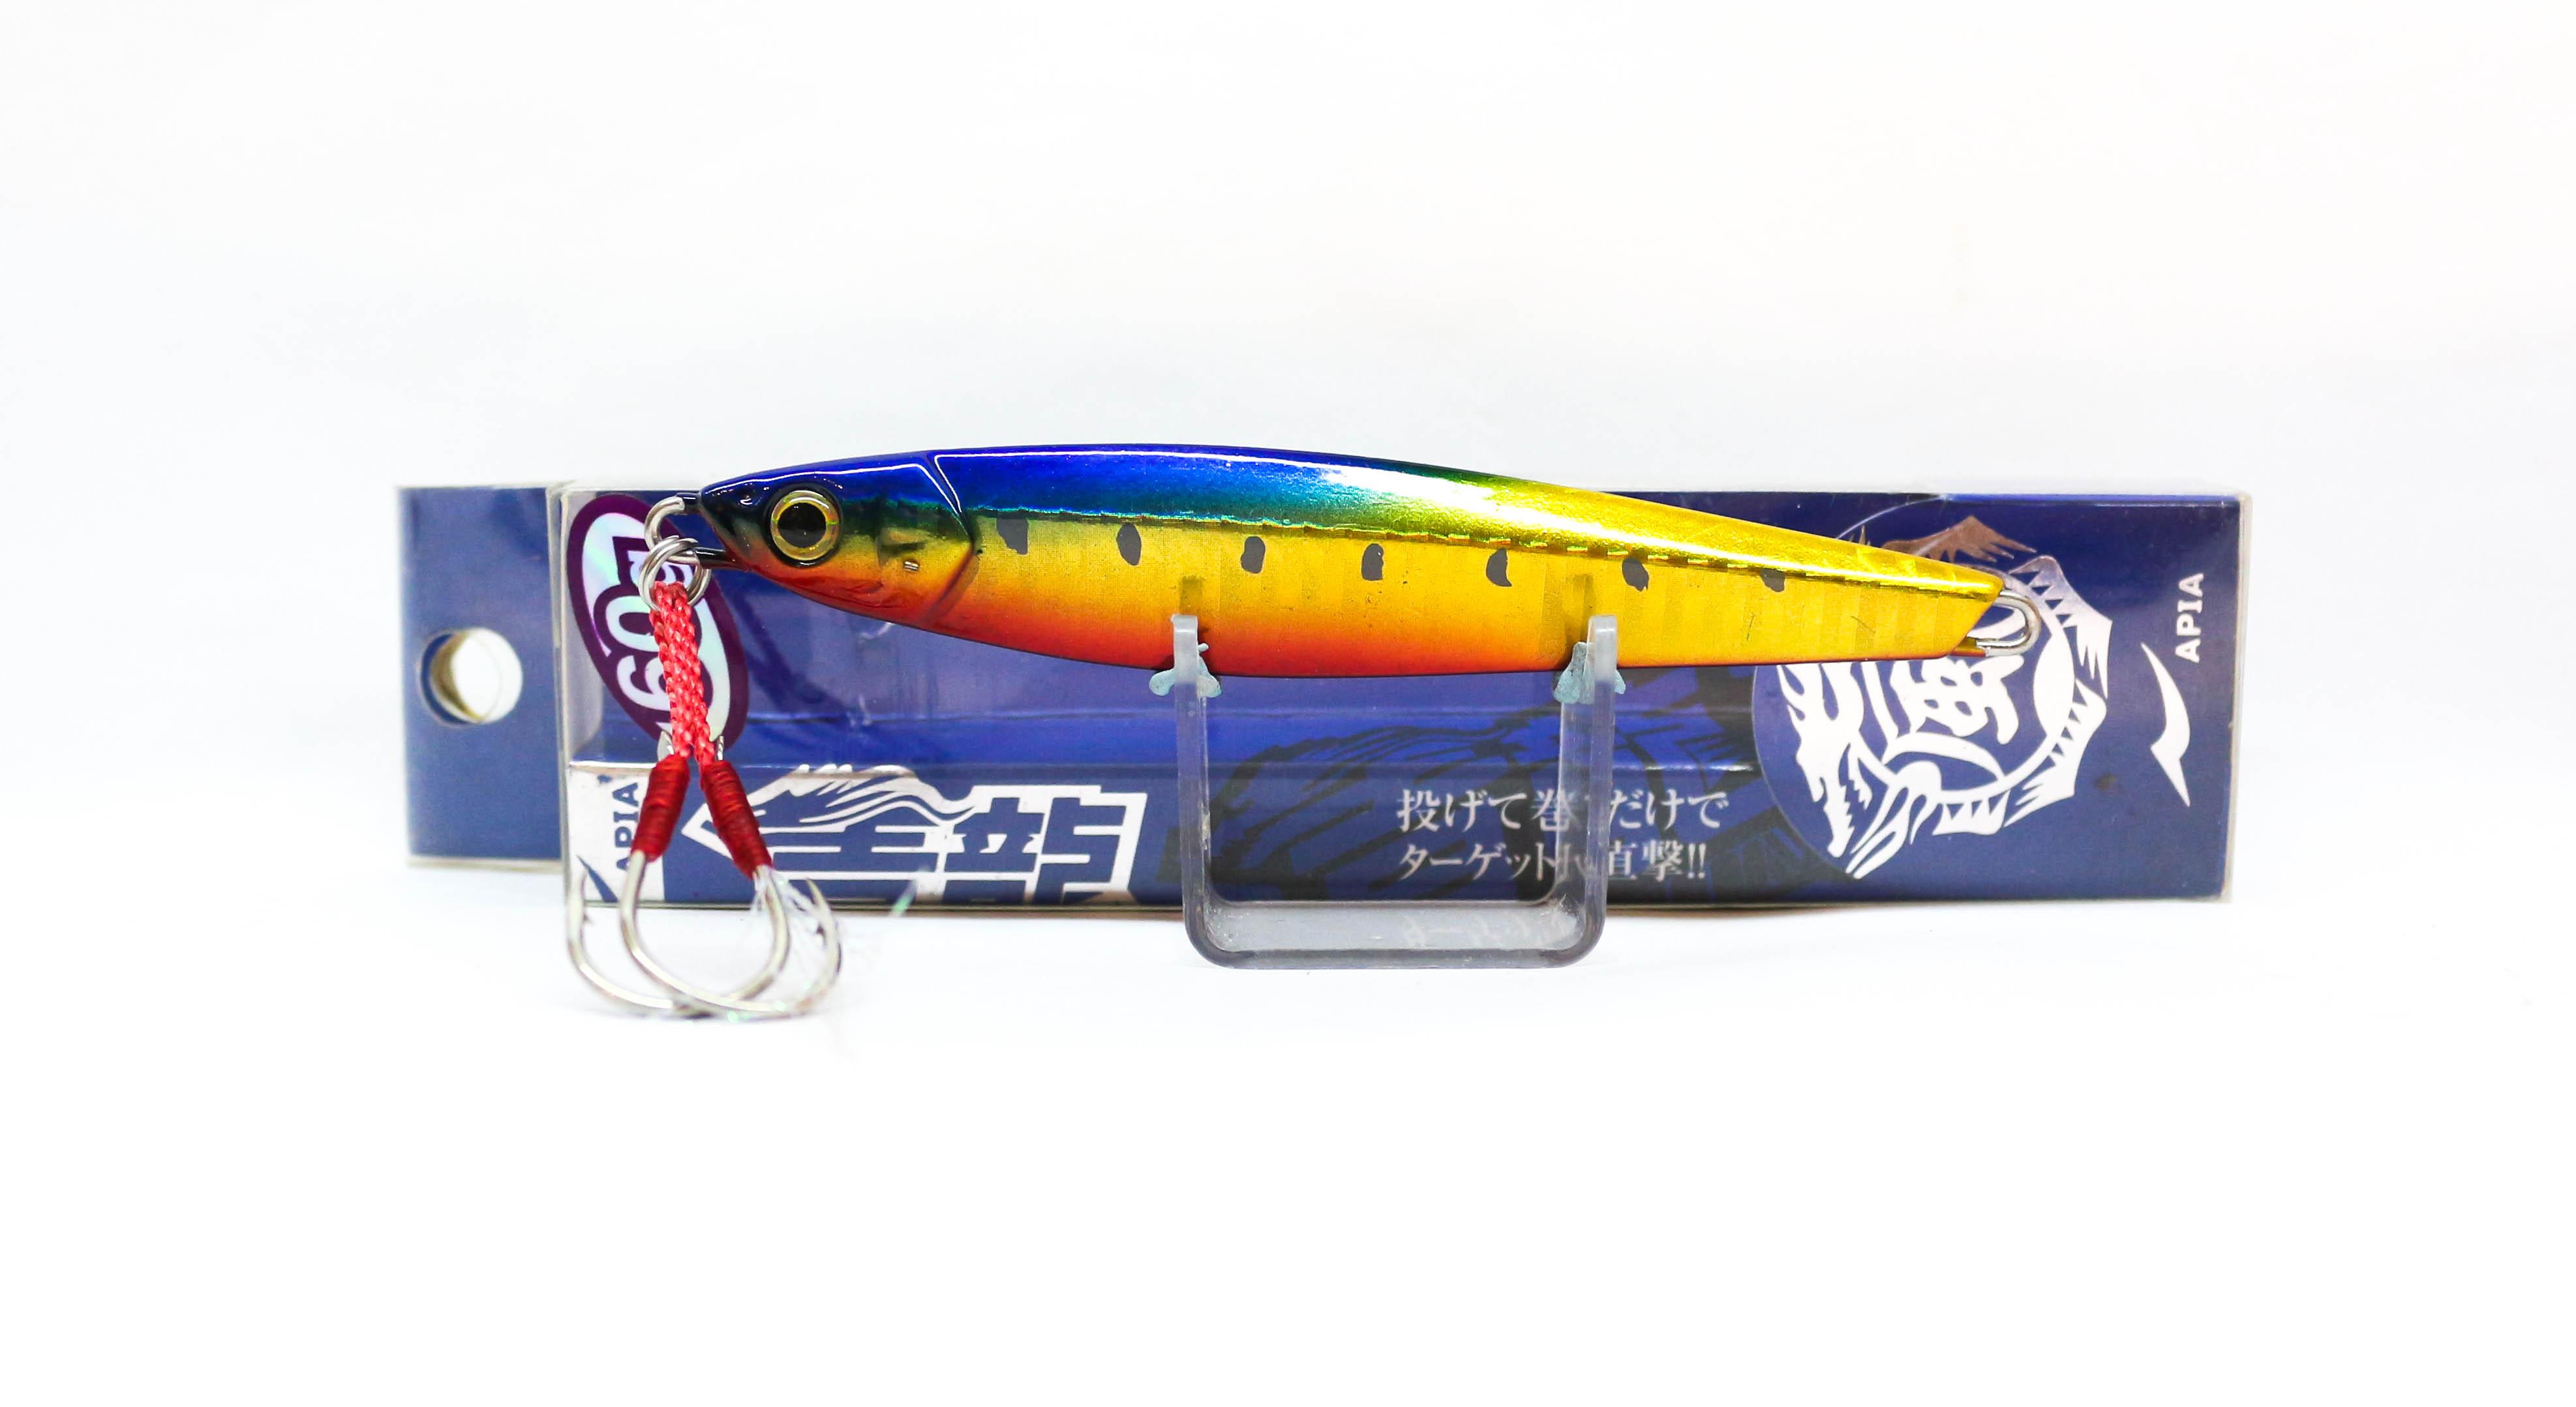 Sale Apia Metal Jig Seiryu Premium 60 Grams Sinking Lure 02 (4063)